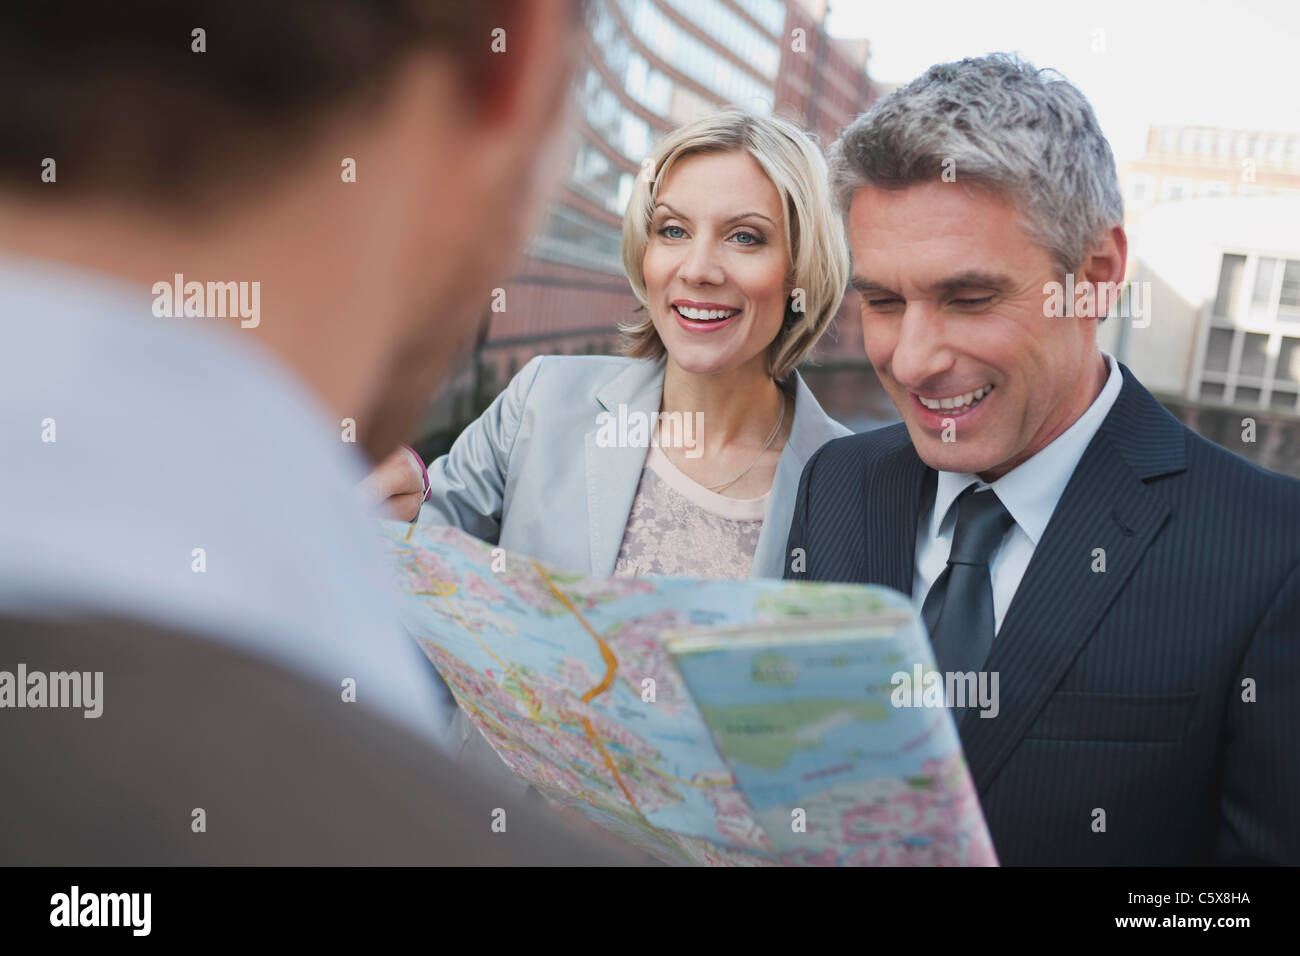 Germany, Hamburg, Business people holding city map, smiling, portrait Stock Photo